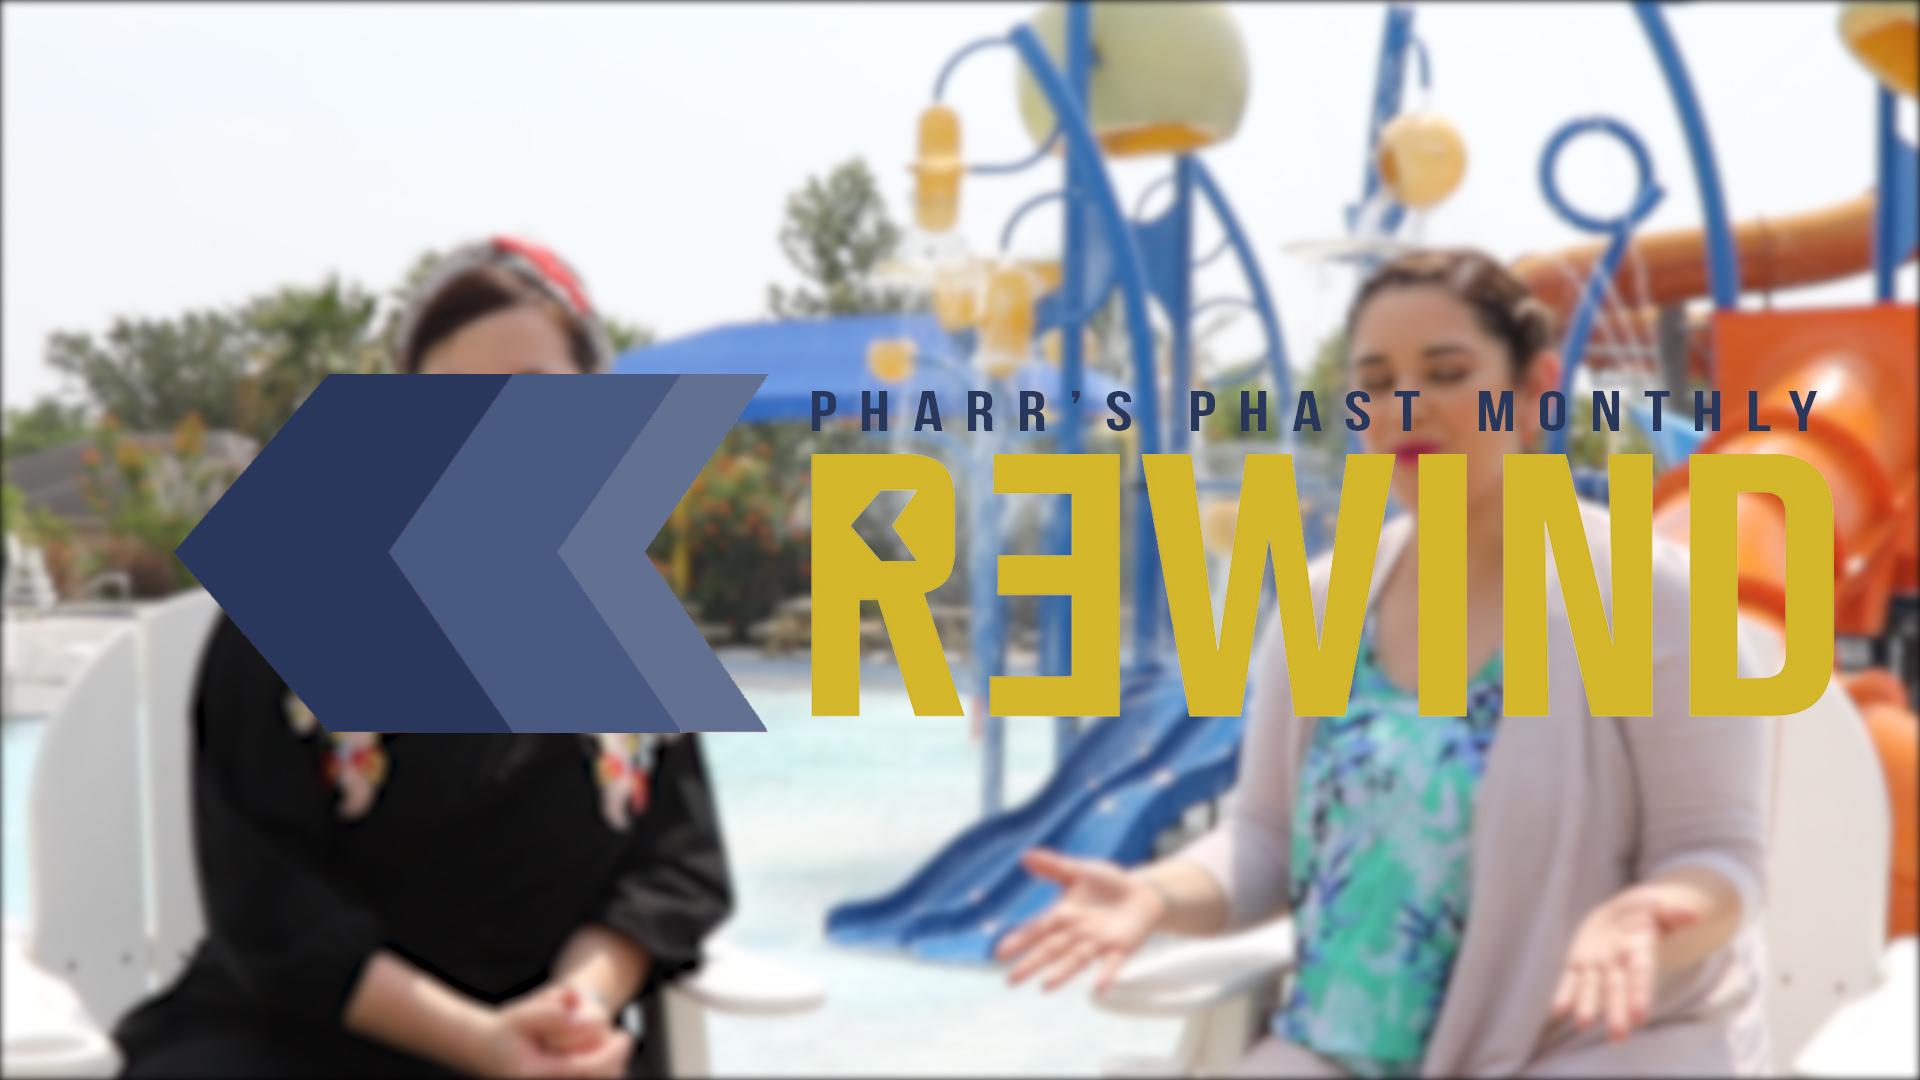 Pharr's Phast Monthly Rewind – May 2019 | City of Pharr